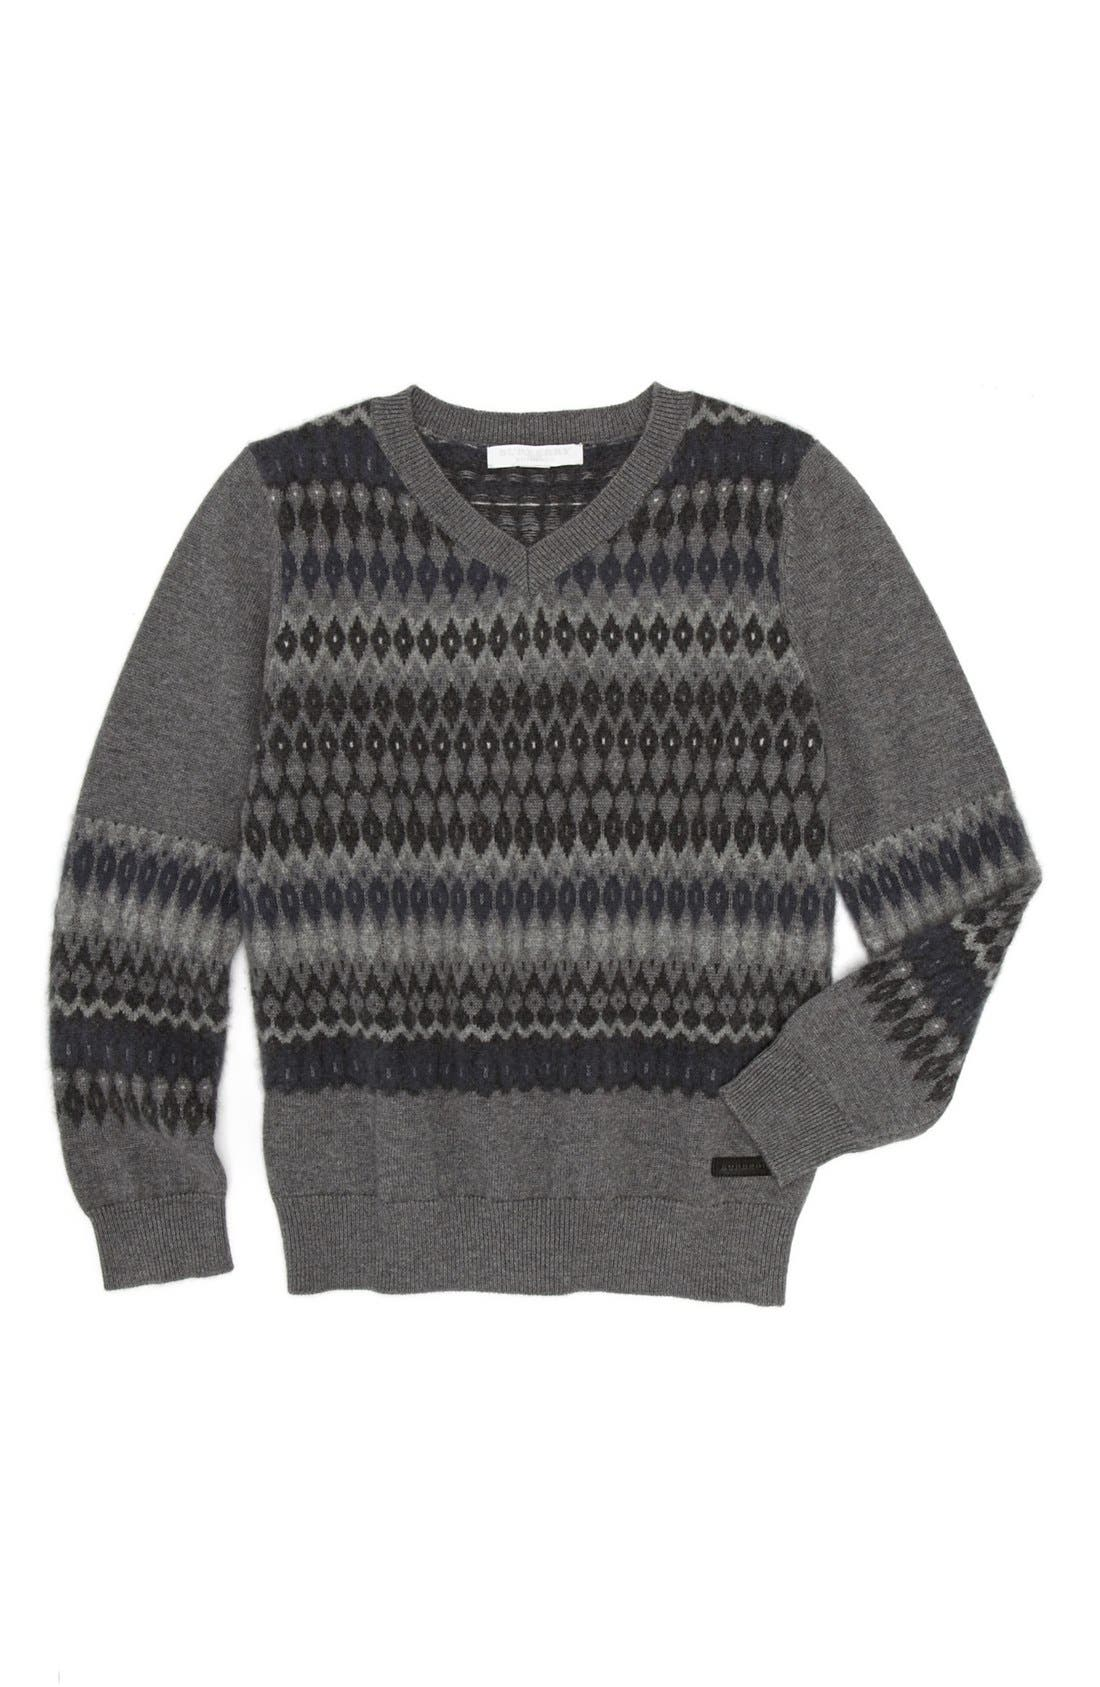 Alternate Image 1 Selected - Burberry Sweater (Little Boys & Big Boys)